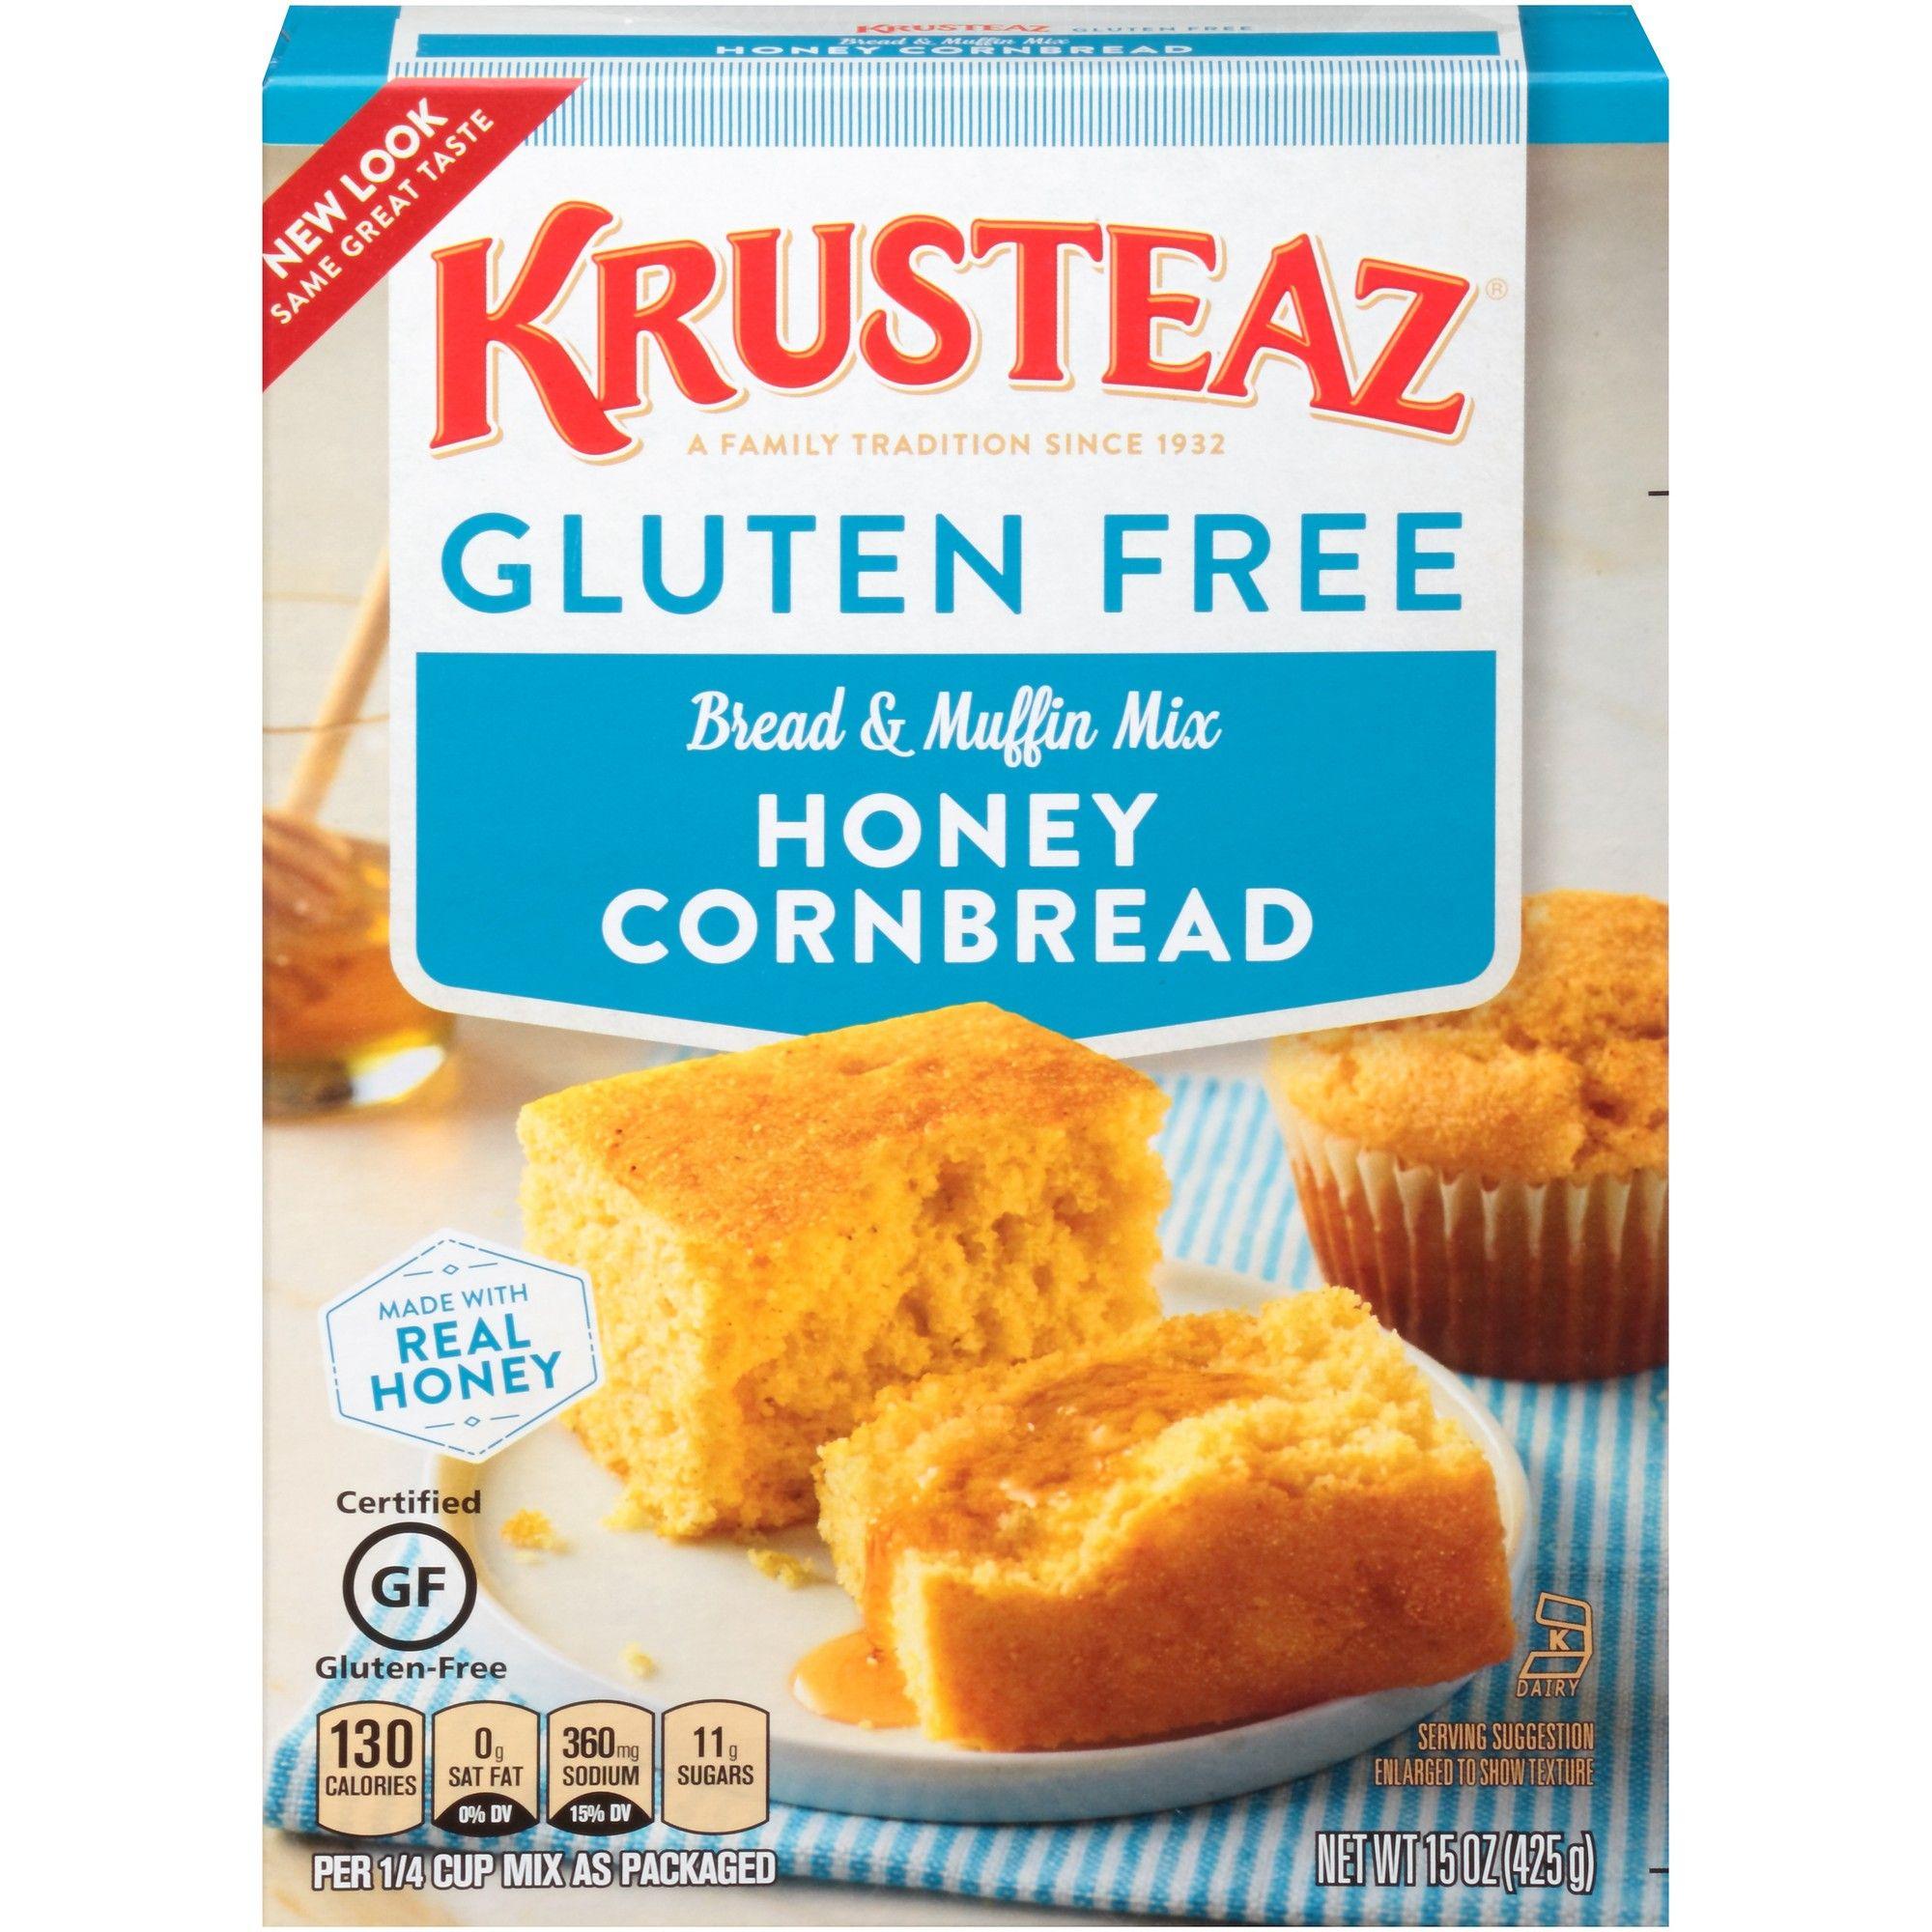 Krusteaz Gluten Free Cornbread Mix And Muffin Mix 15oz Krusteaz Gluten Free Honey Cornbread Gluten Free Cornbread Mix